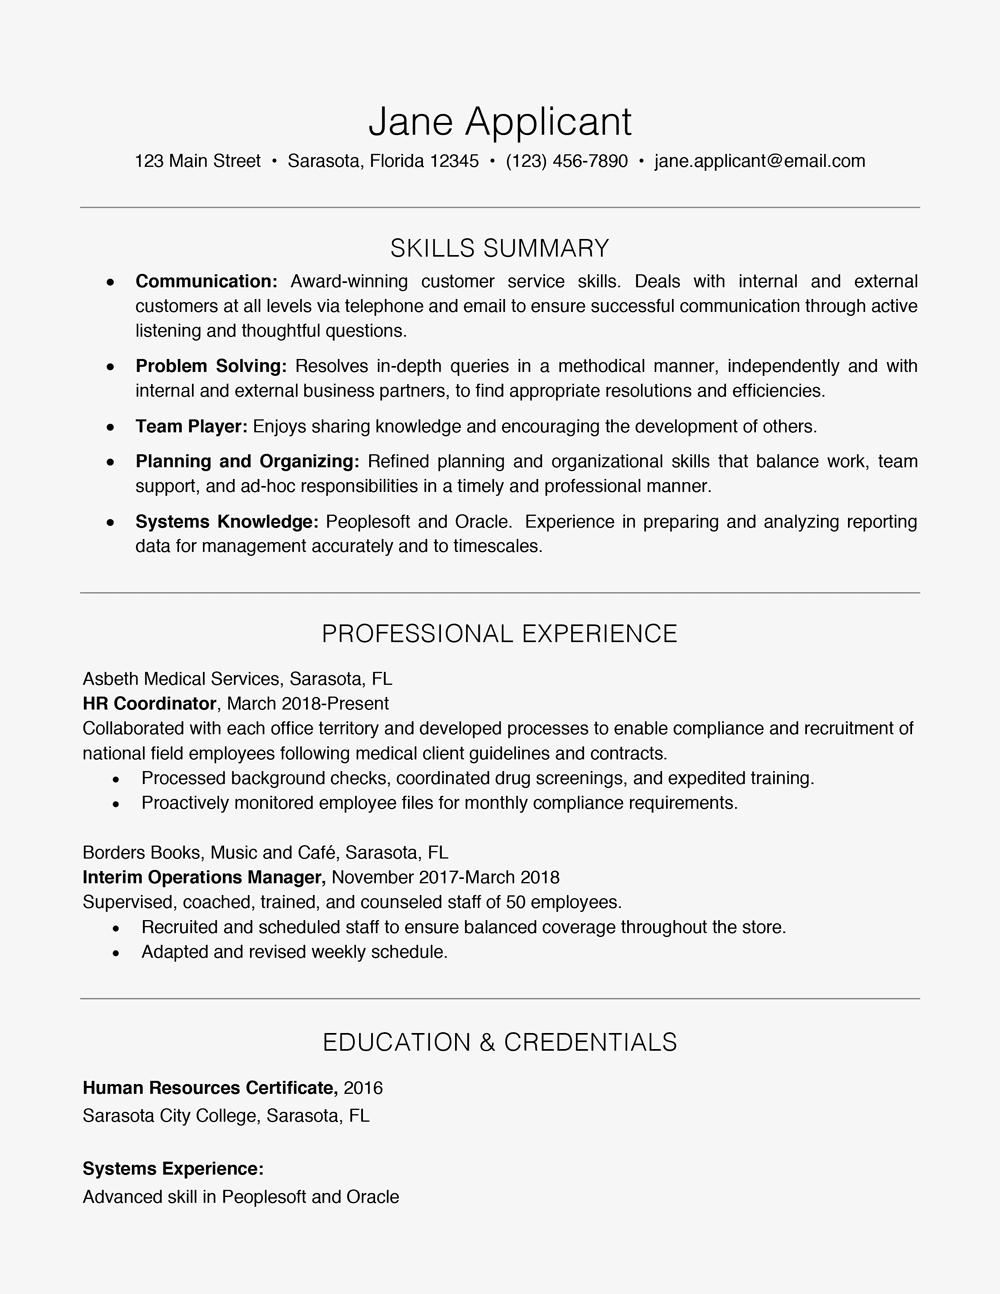 Resume Format Key Skills Resume skills, Resume examples